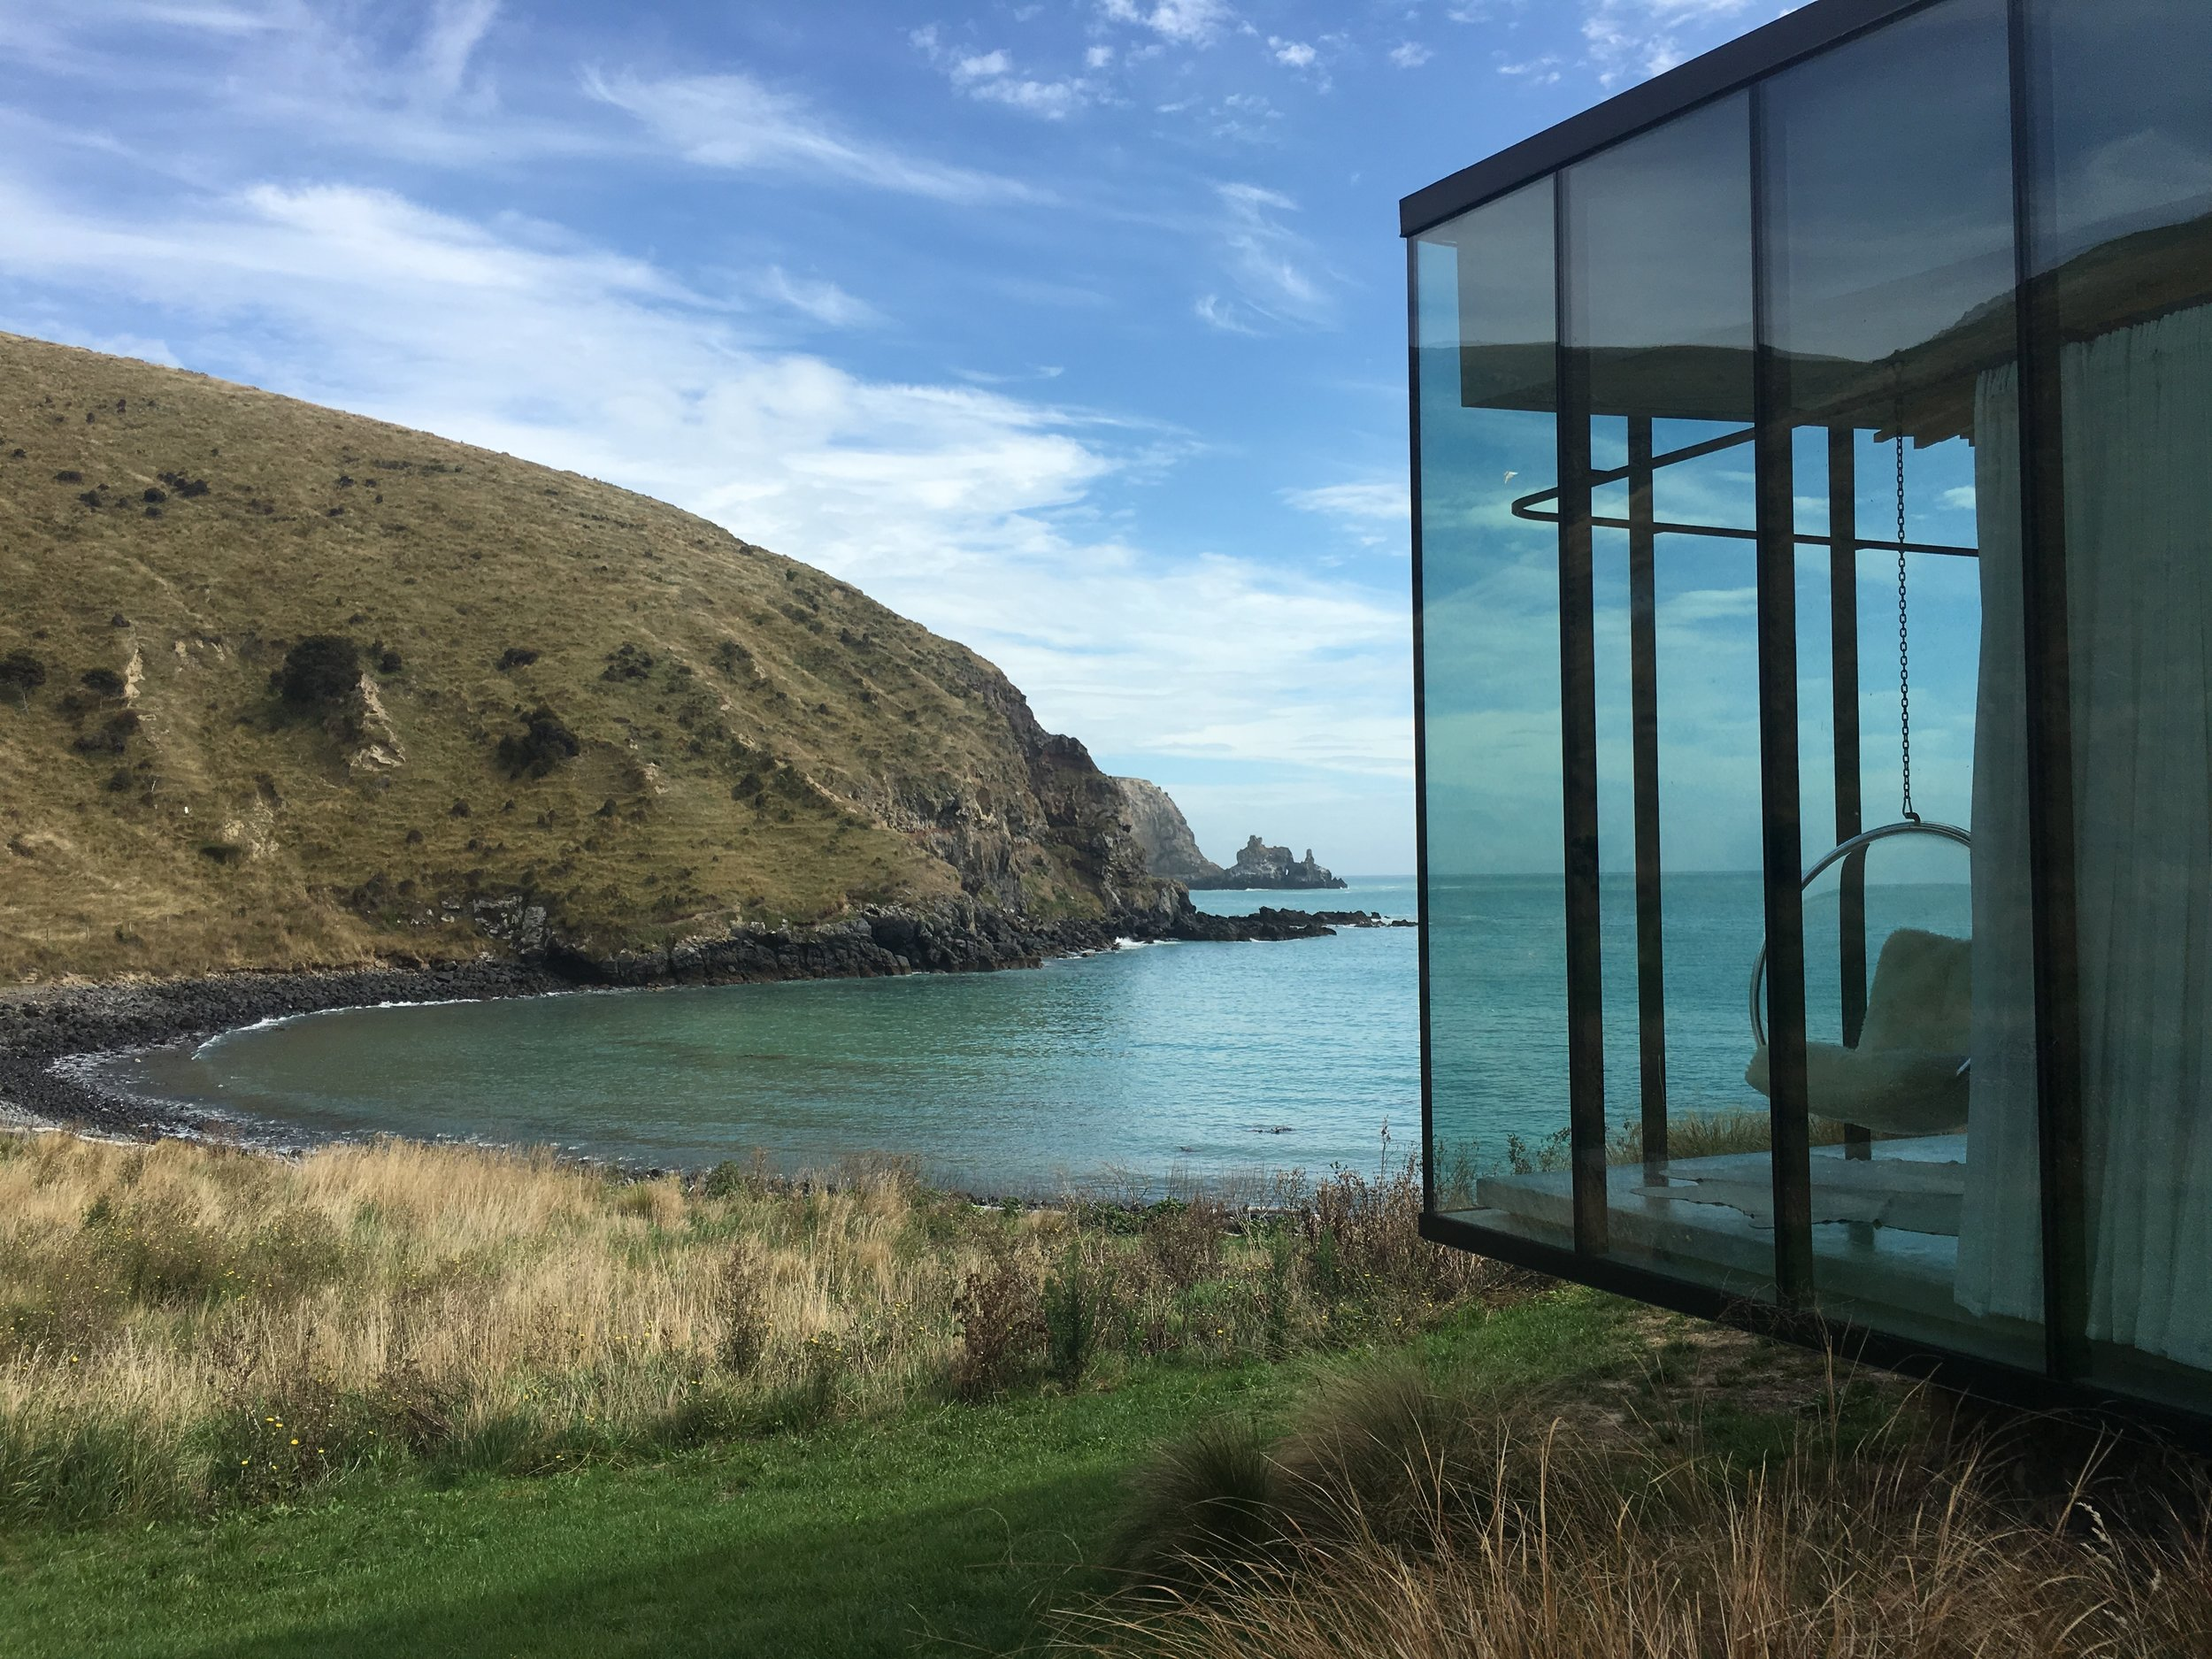 Seascape Villa, Annandale, New Zealand